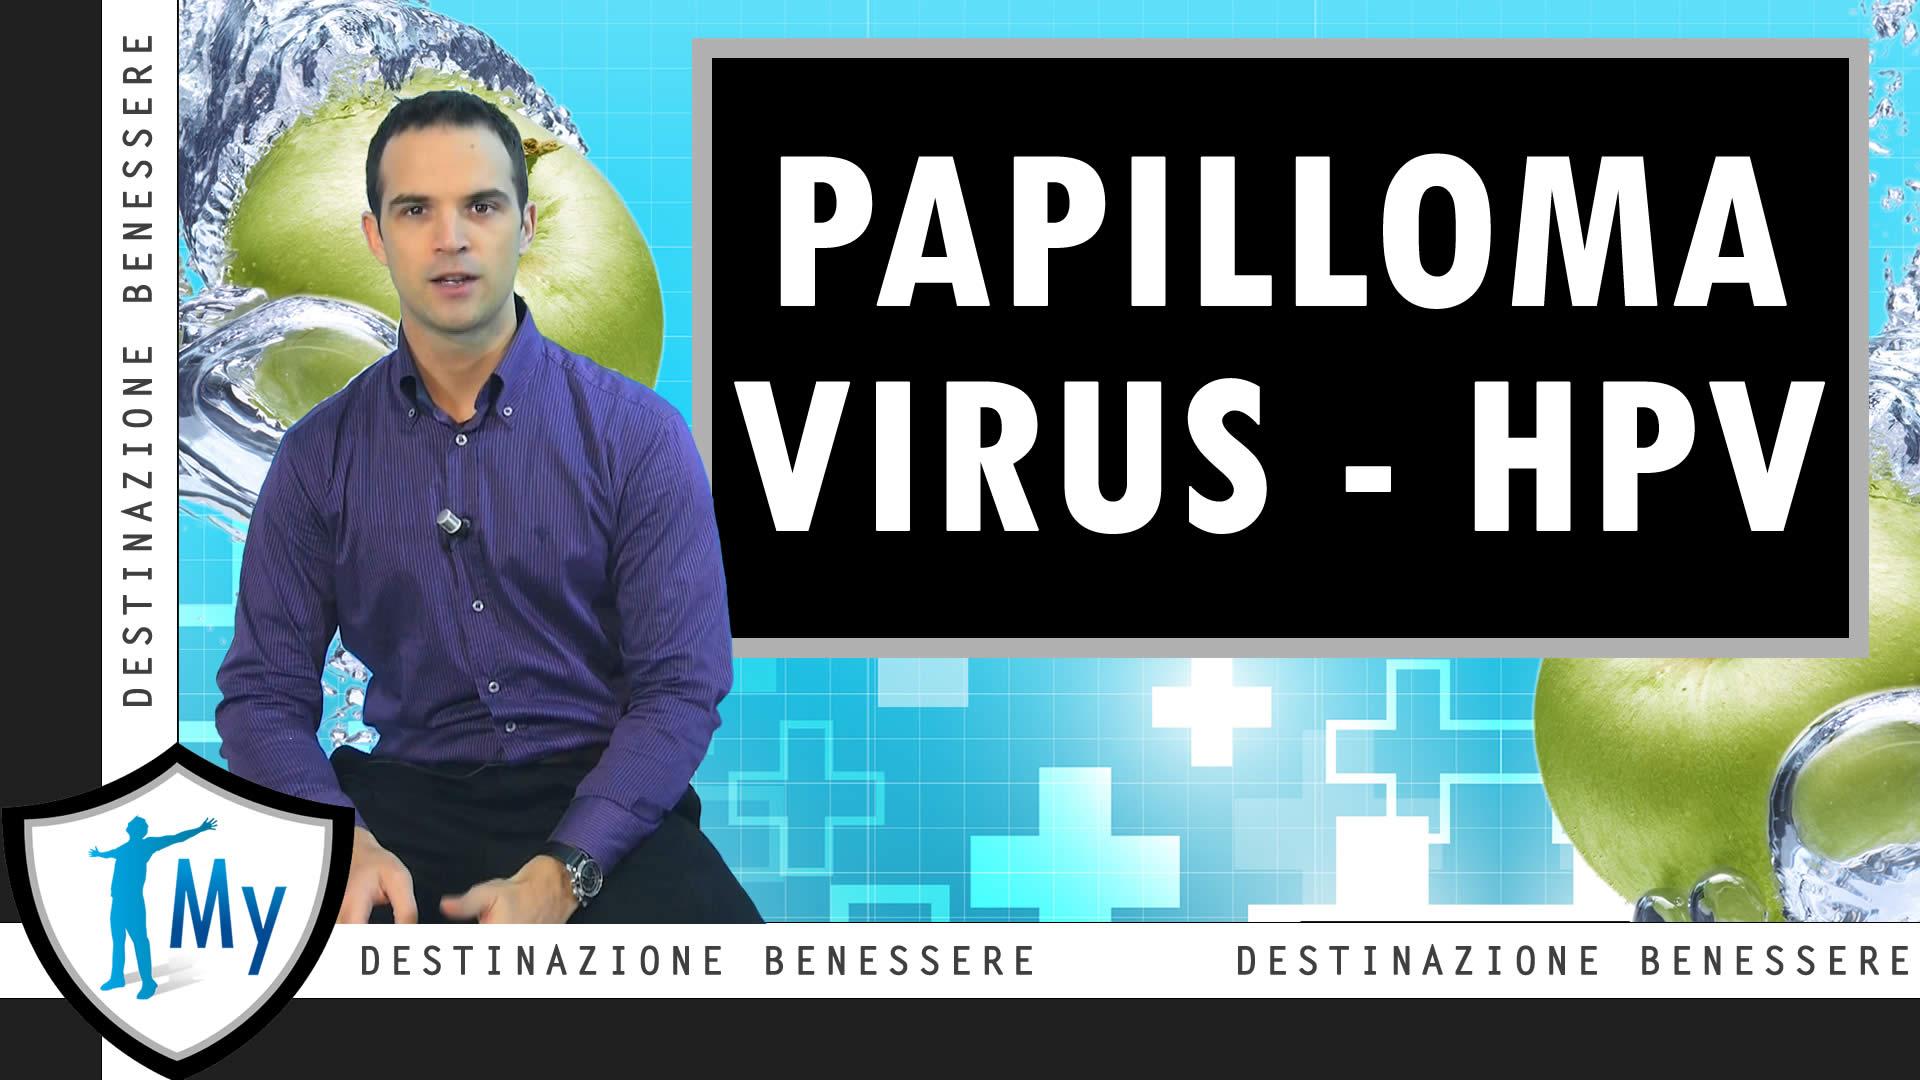 papilloma sintomi perdite